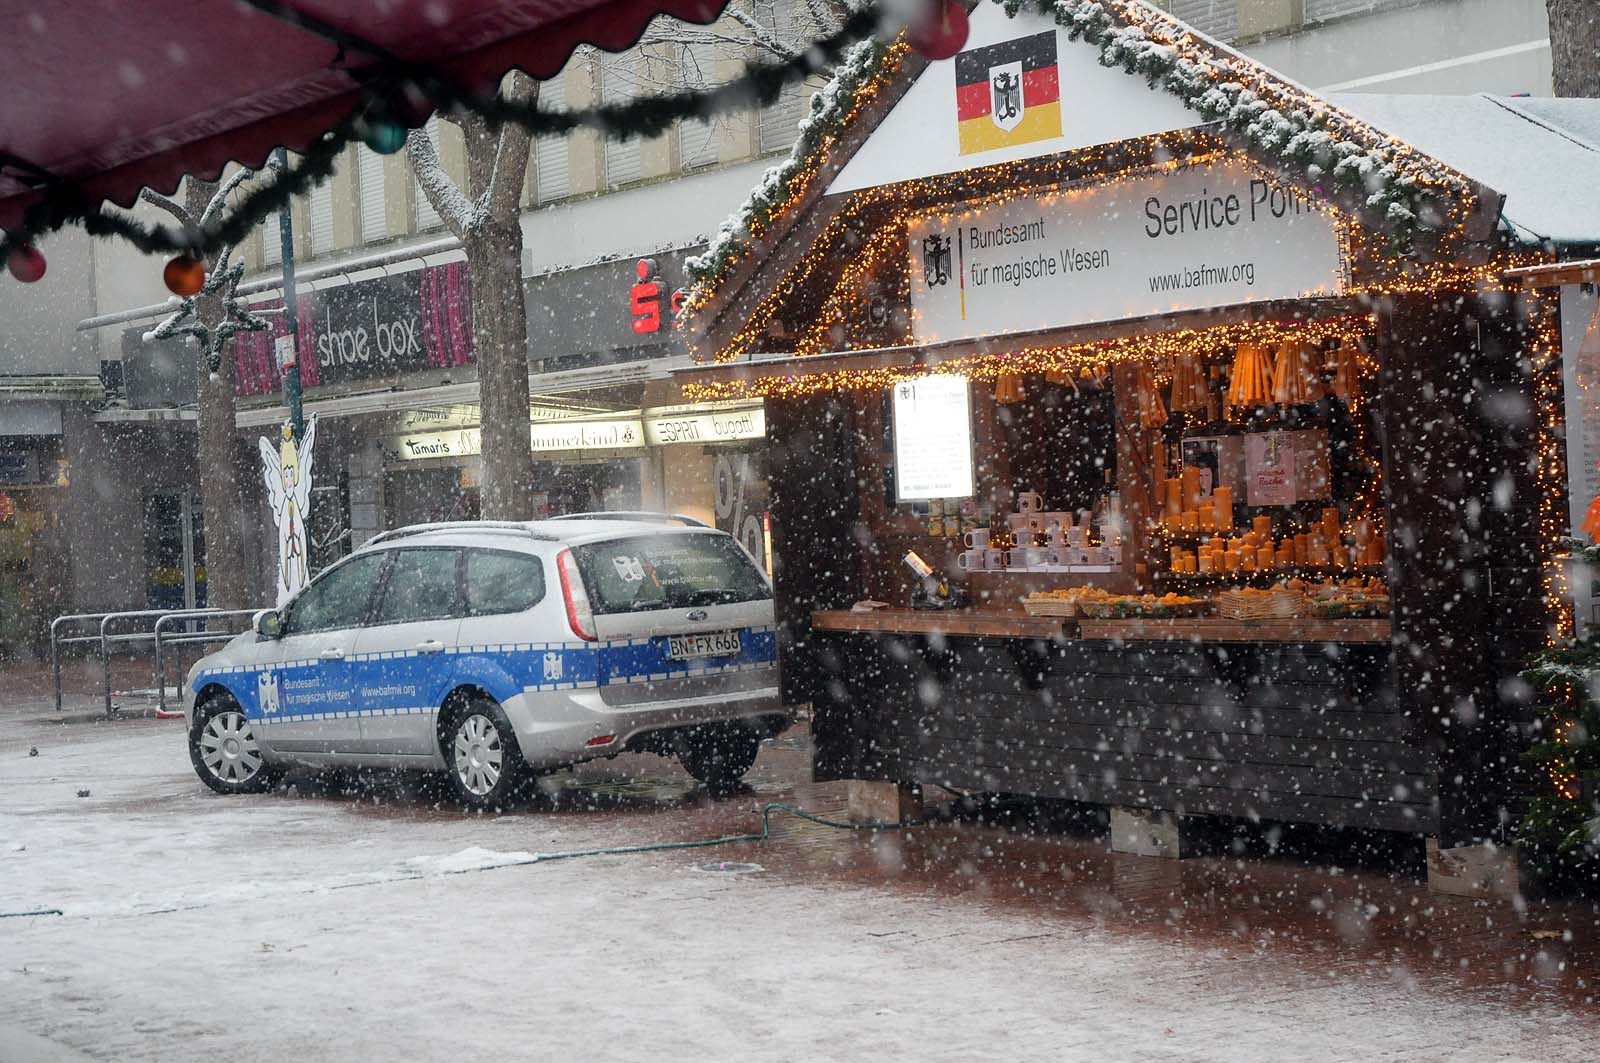 Nikolausmarkt Bad Godesberg 2017 mit dem Bundesamt für magische Wesen (Foto: Bundesamt für magische Wesen)